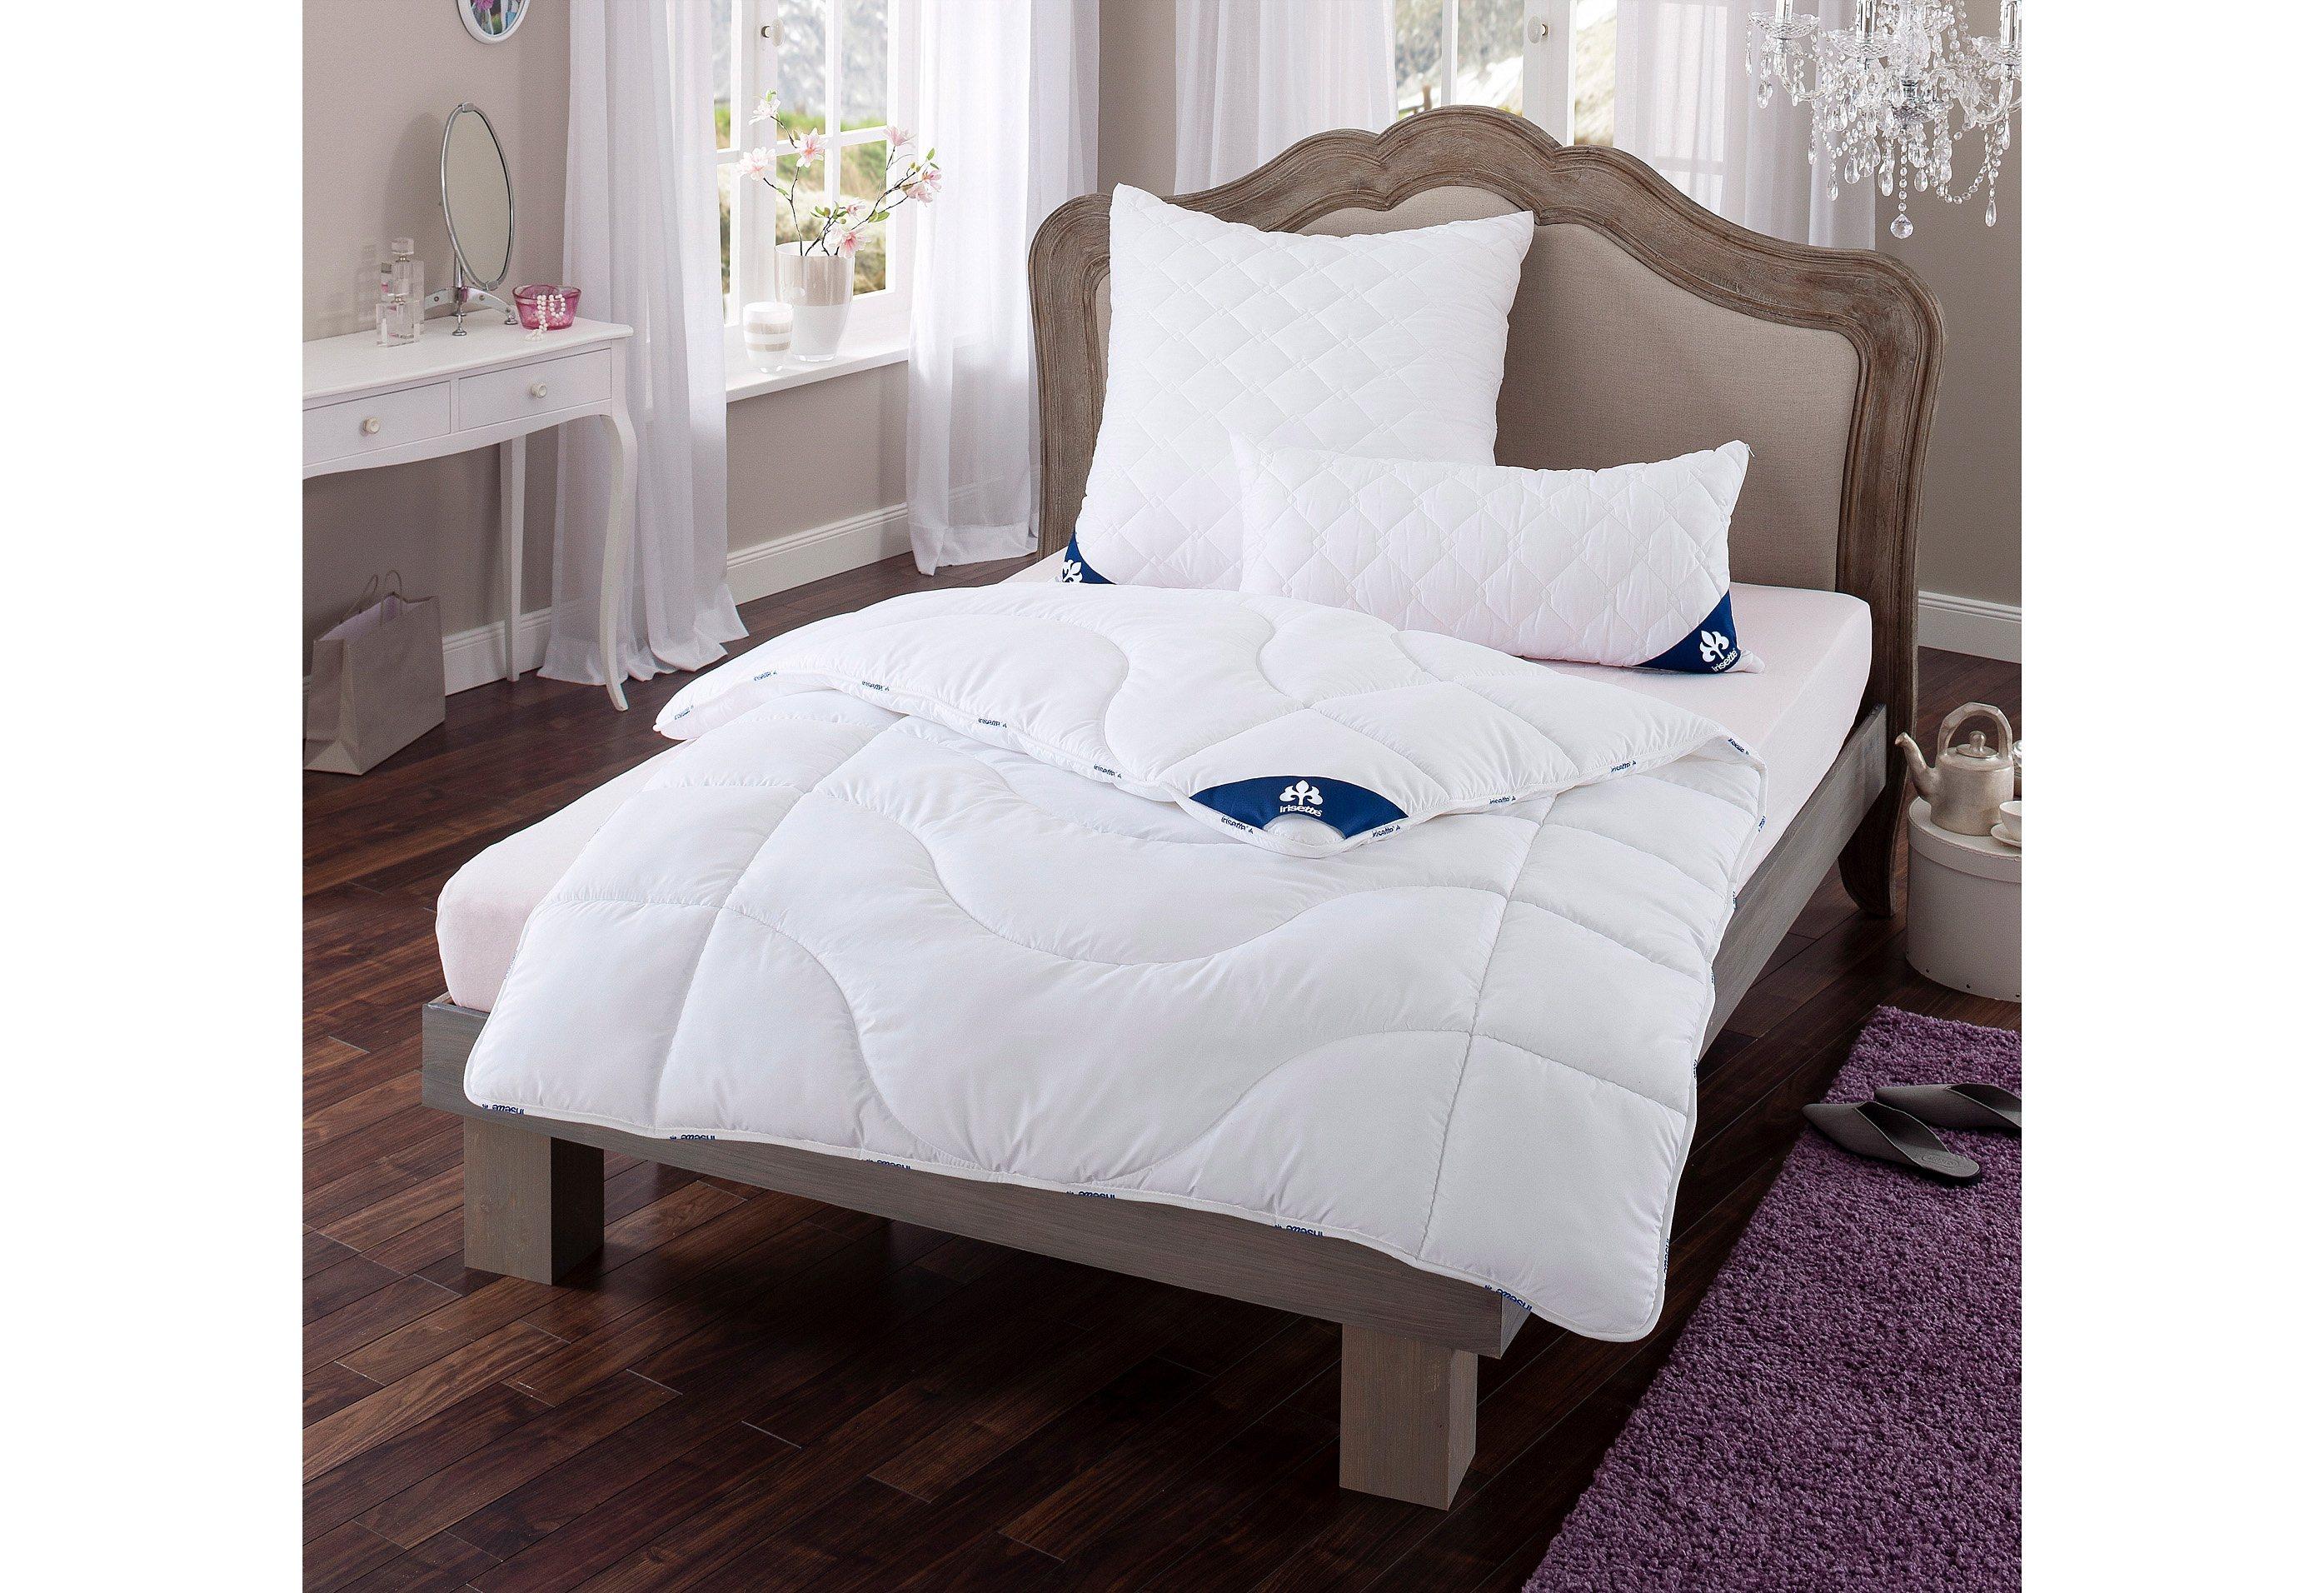 steppbett irisette preisvergleich. Black Bedroom Furniture Sets. Home Design Ideas